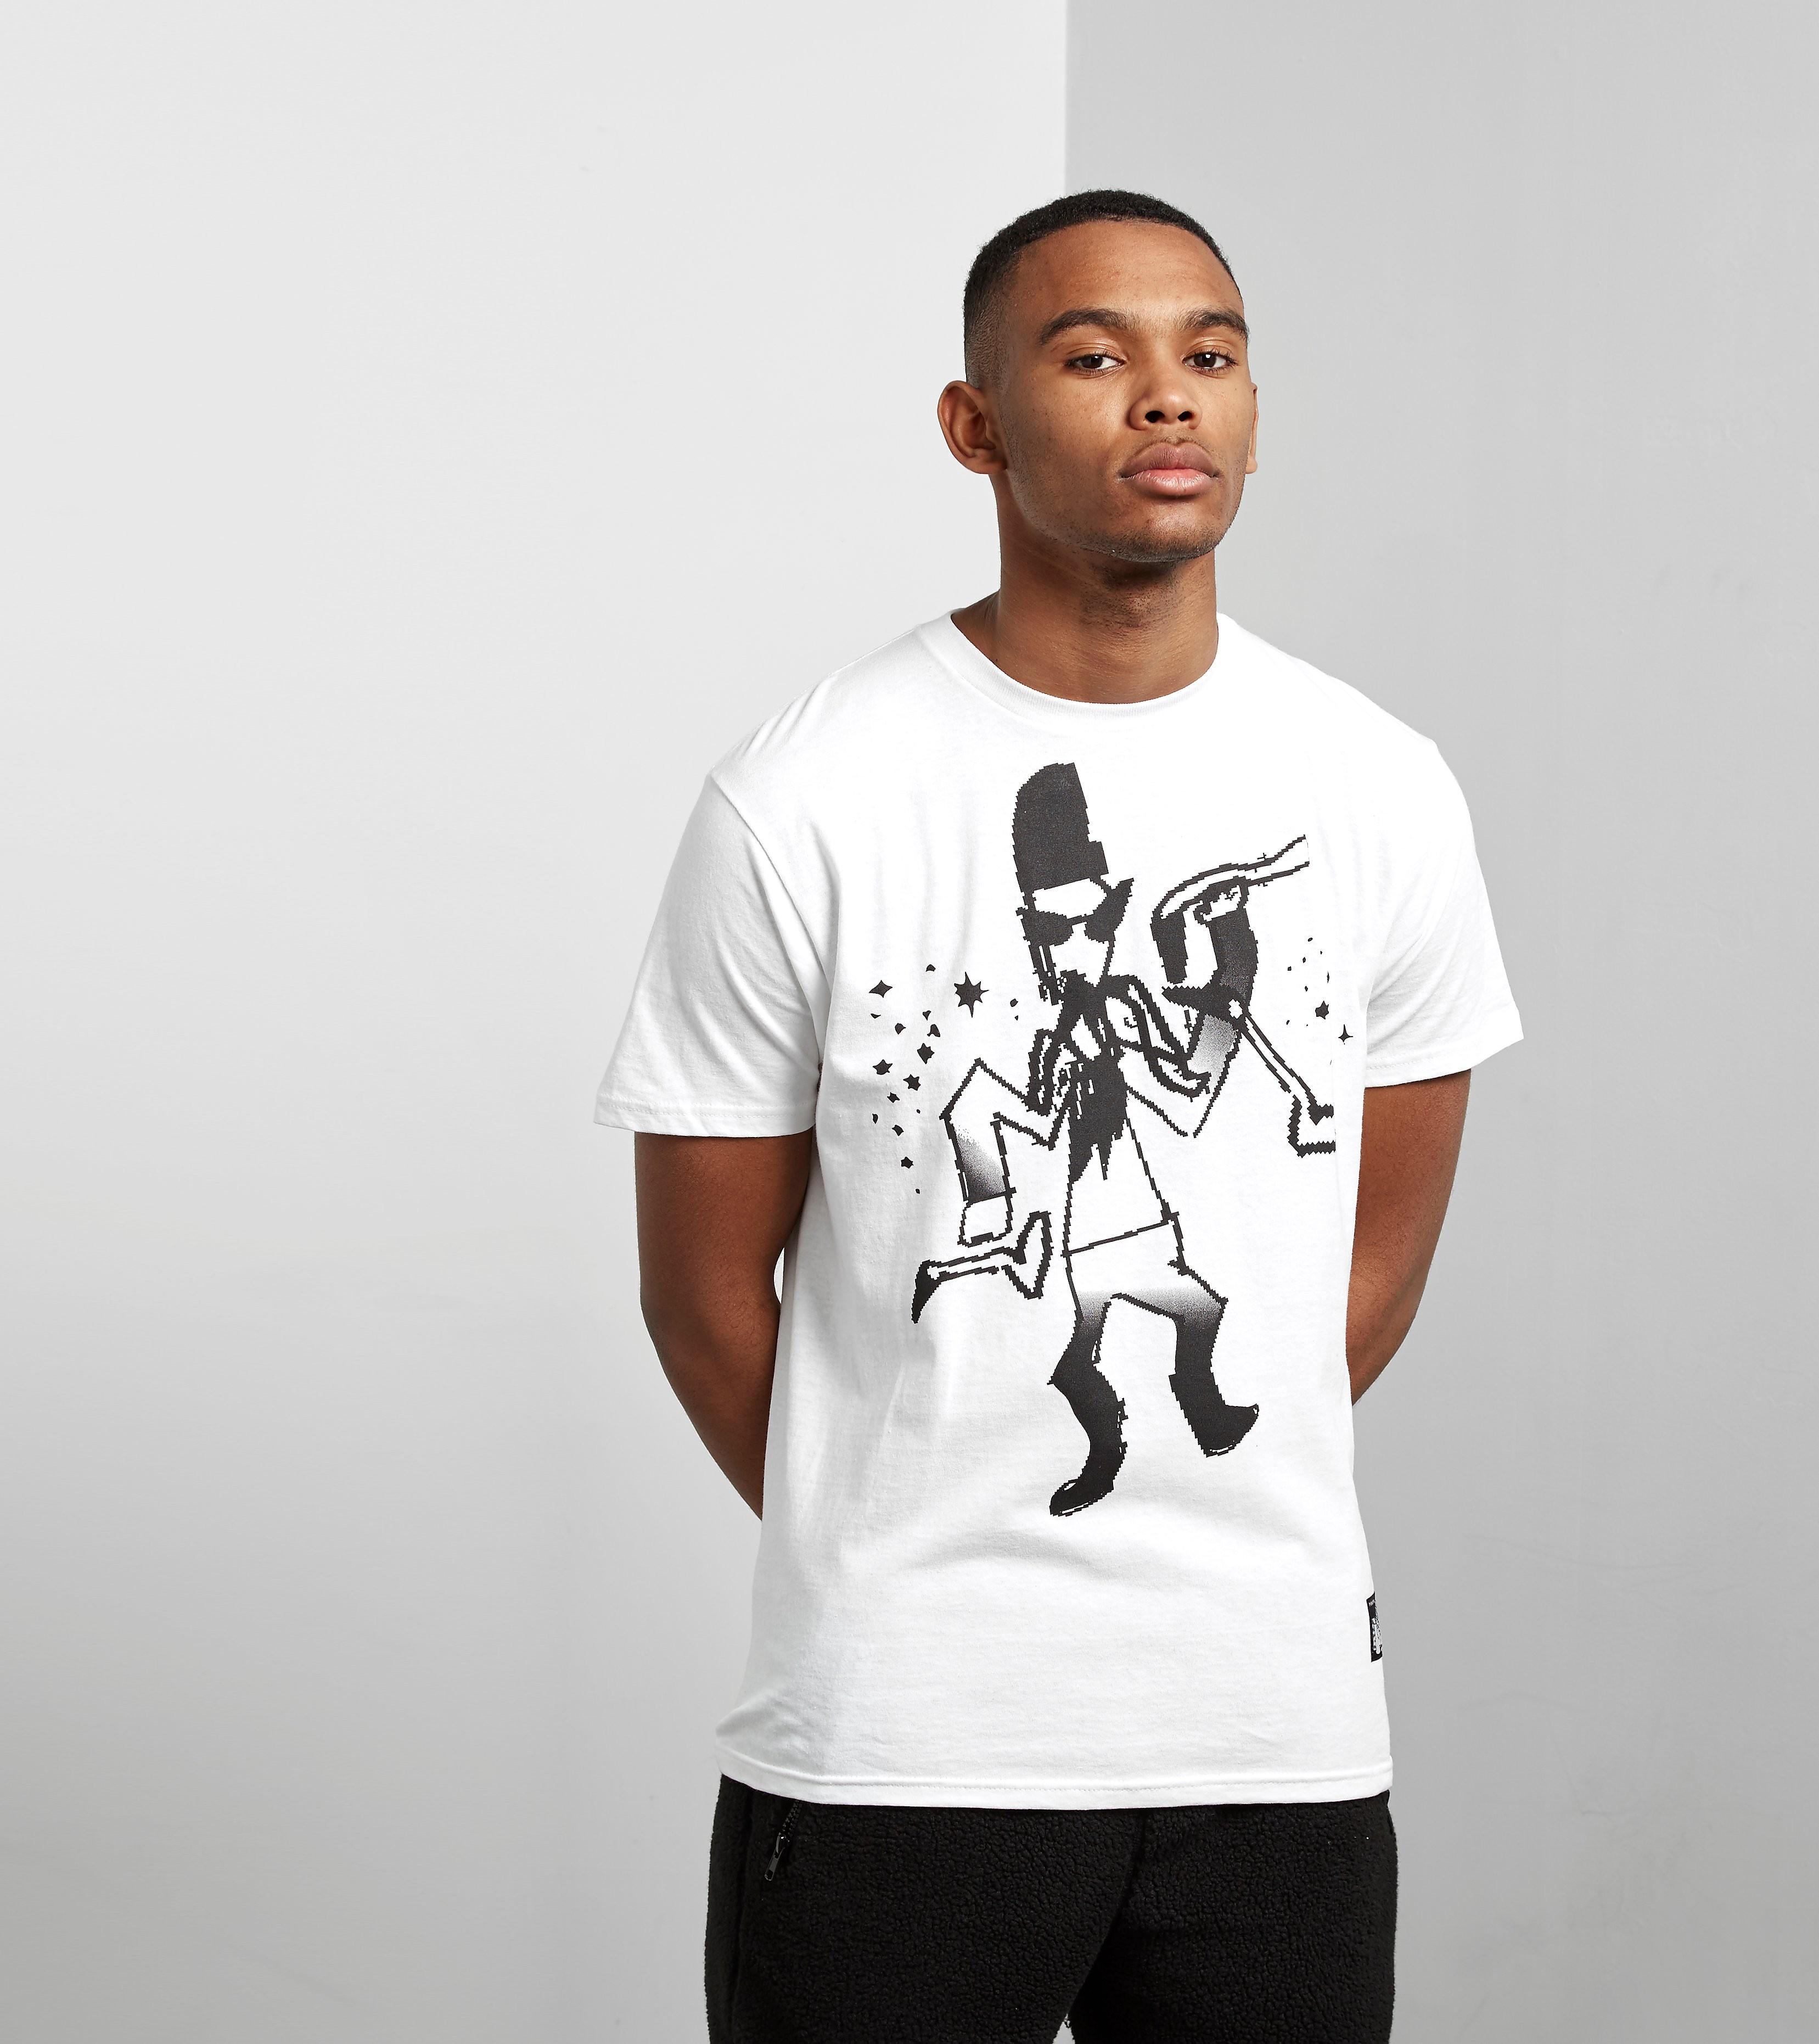 PRMTVO Hittin The Pipes T-shirt